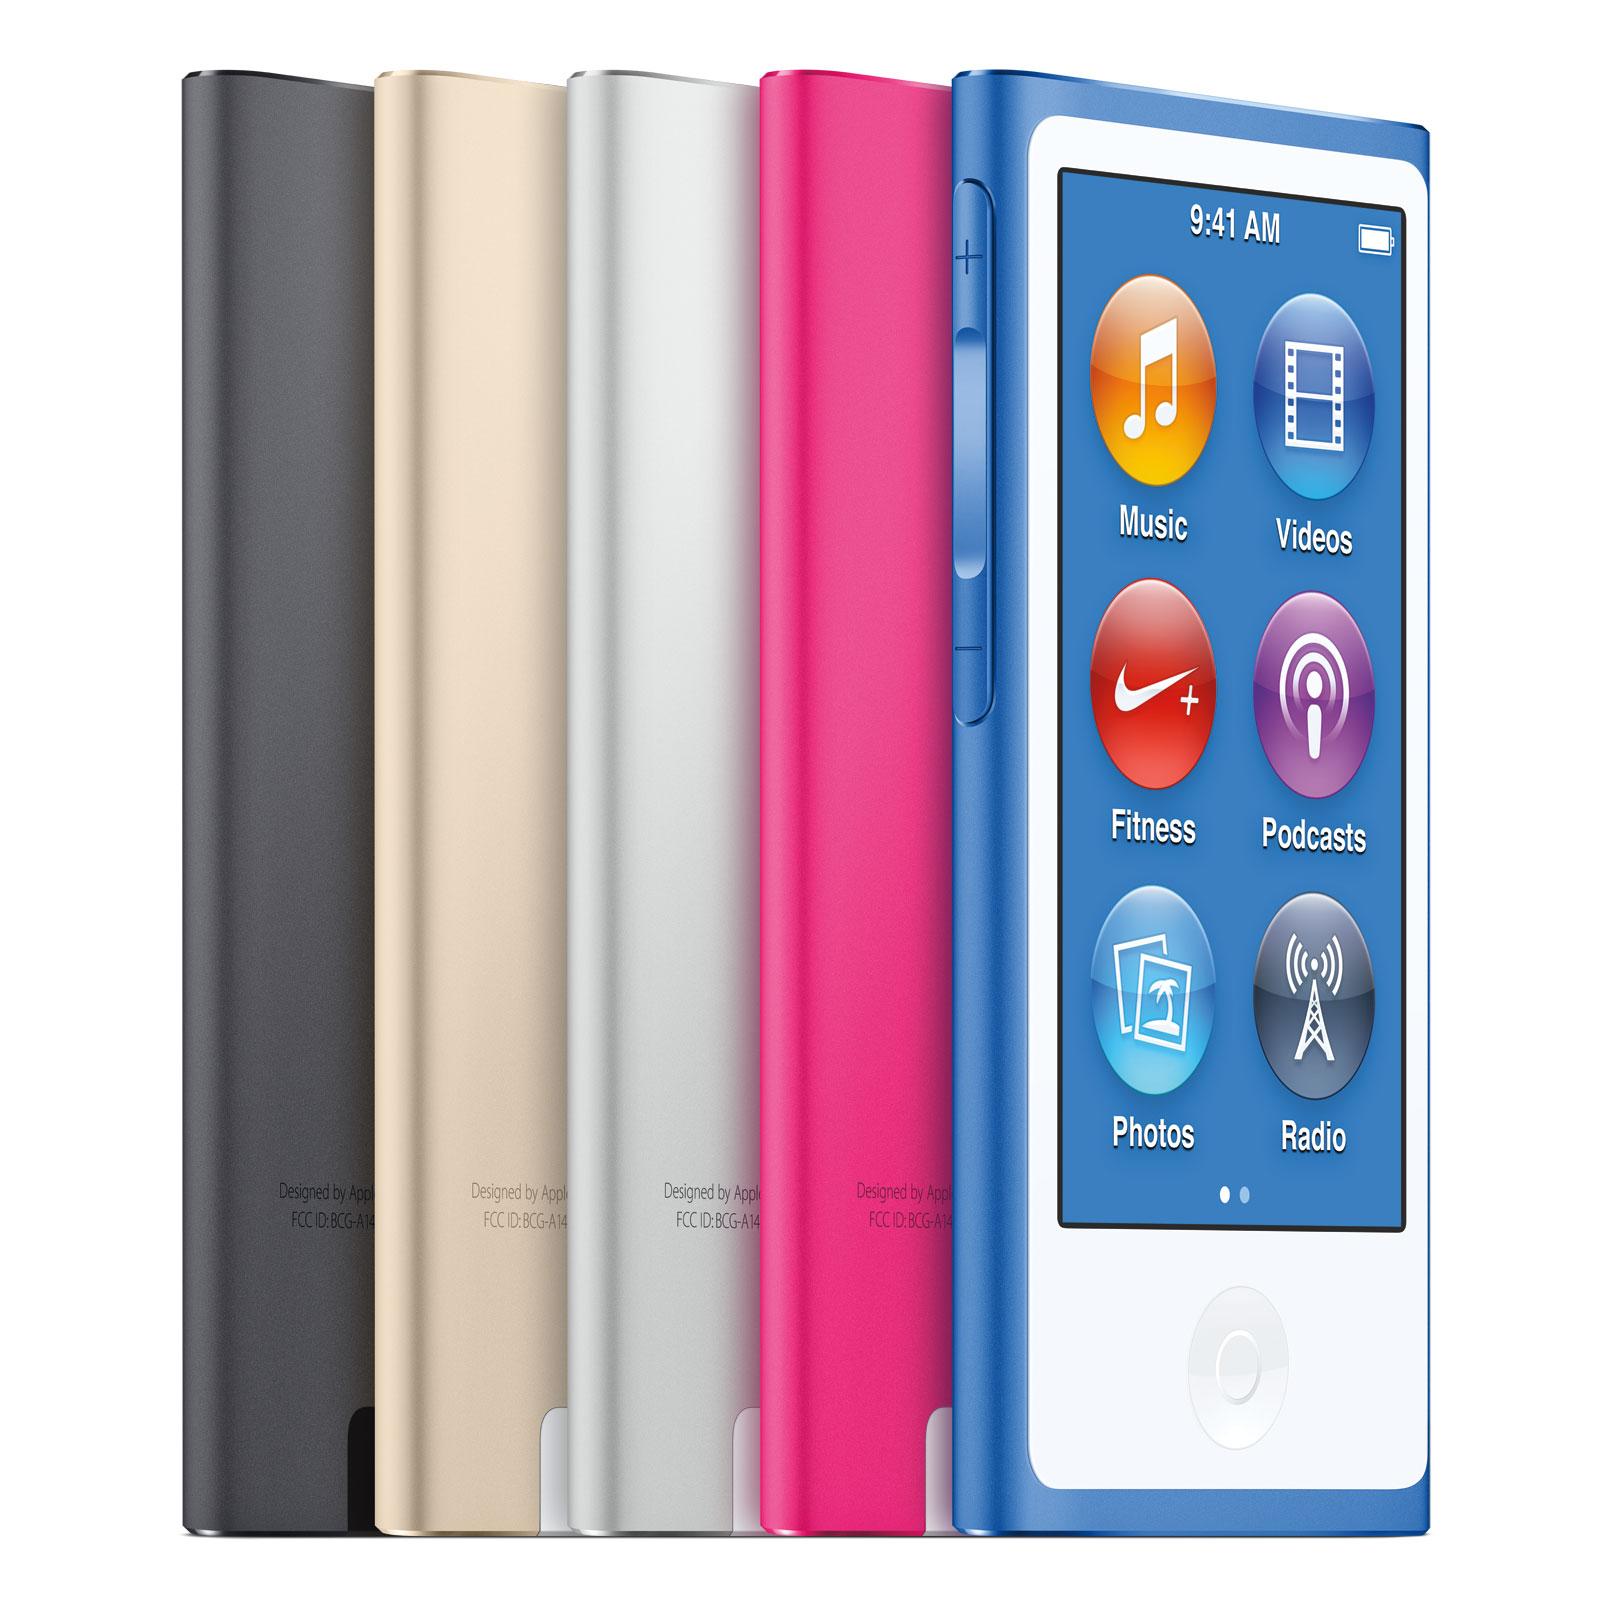 apple ipod nano 16 go rose 2015 mkmv2zd a achat vente lecteur mp3 ipod sur. Black Bedroom Furniture Sets. Home Design Ideas